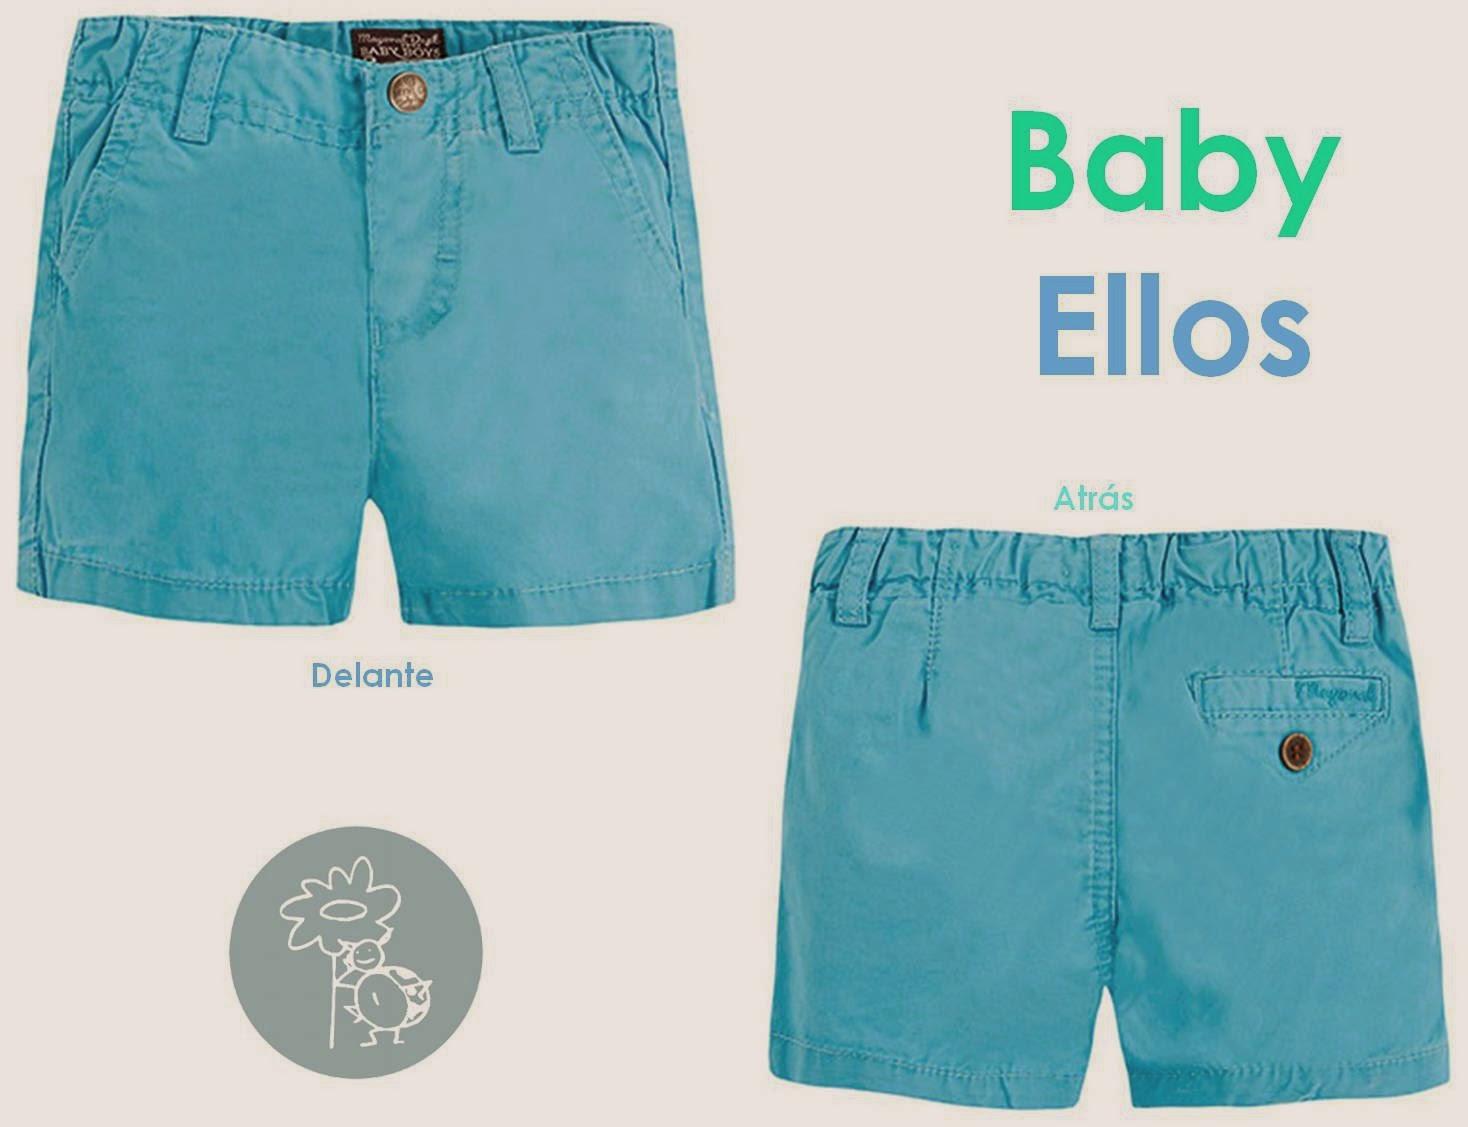 Mayoral pantalon short azul boys en Blog Retamal moda infantil y bebe